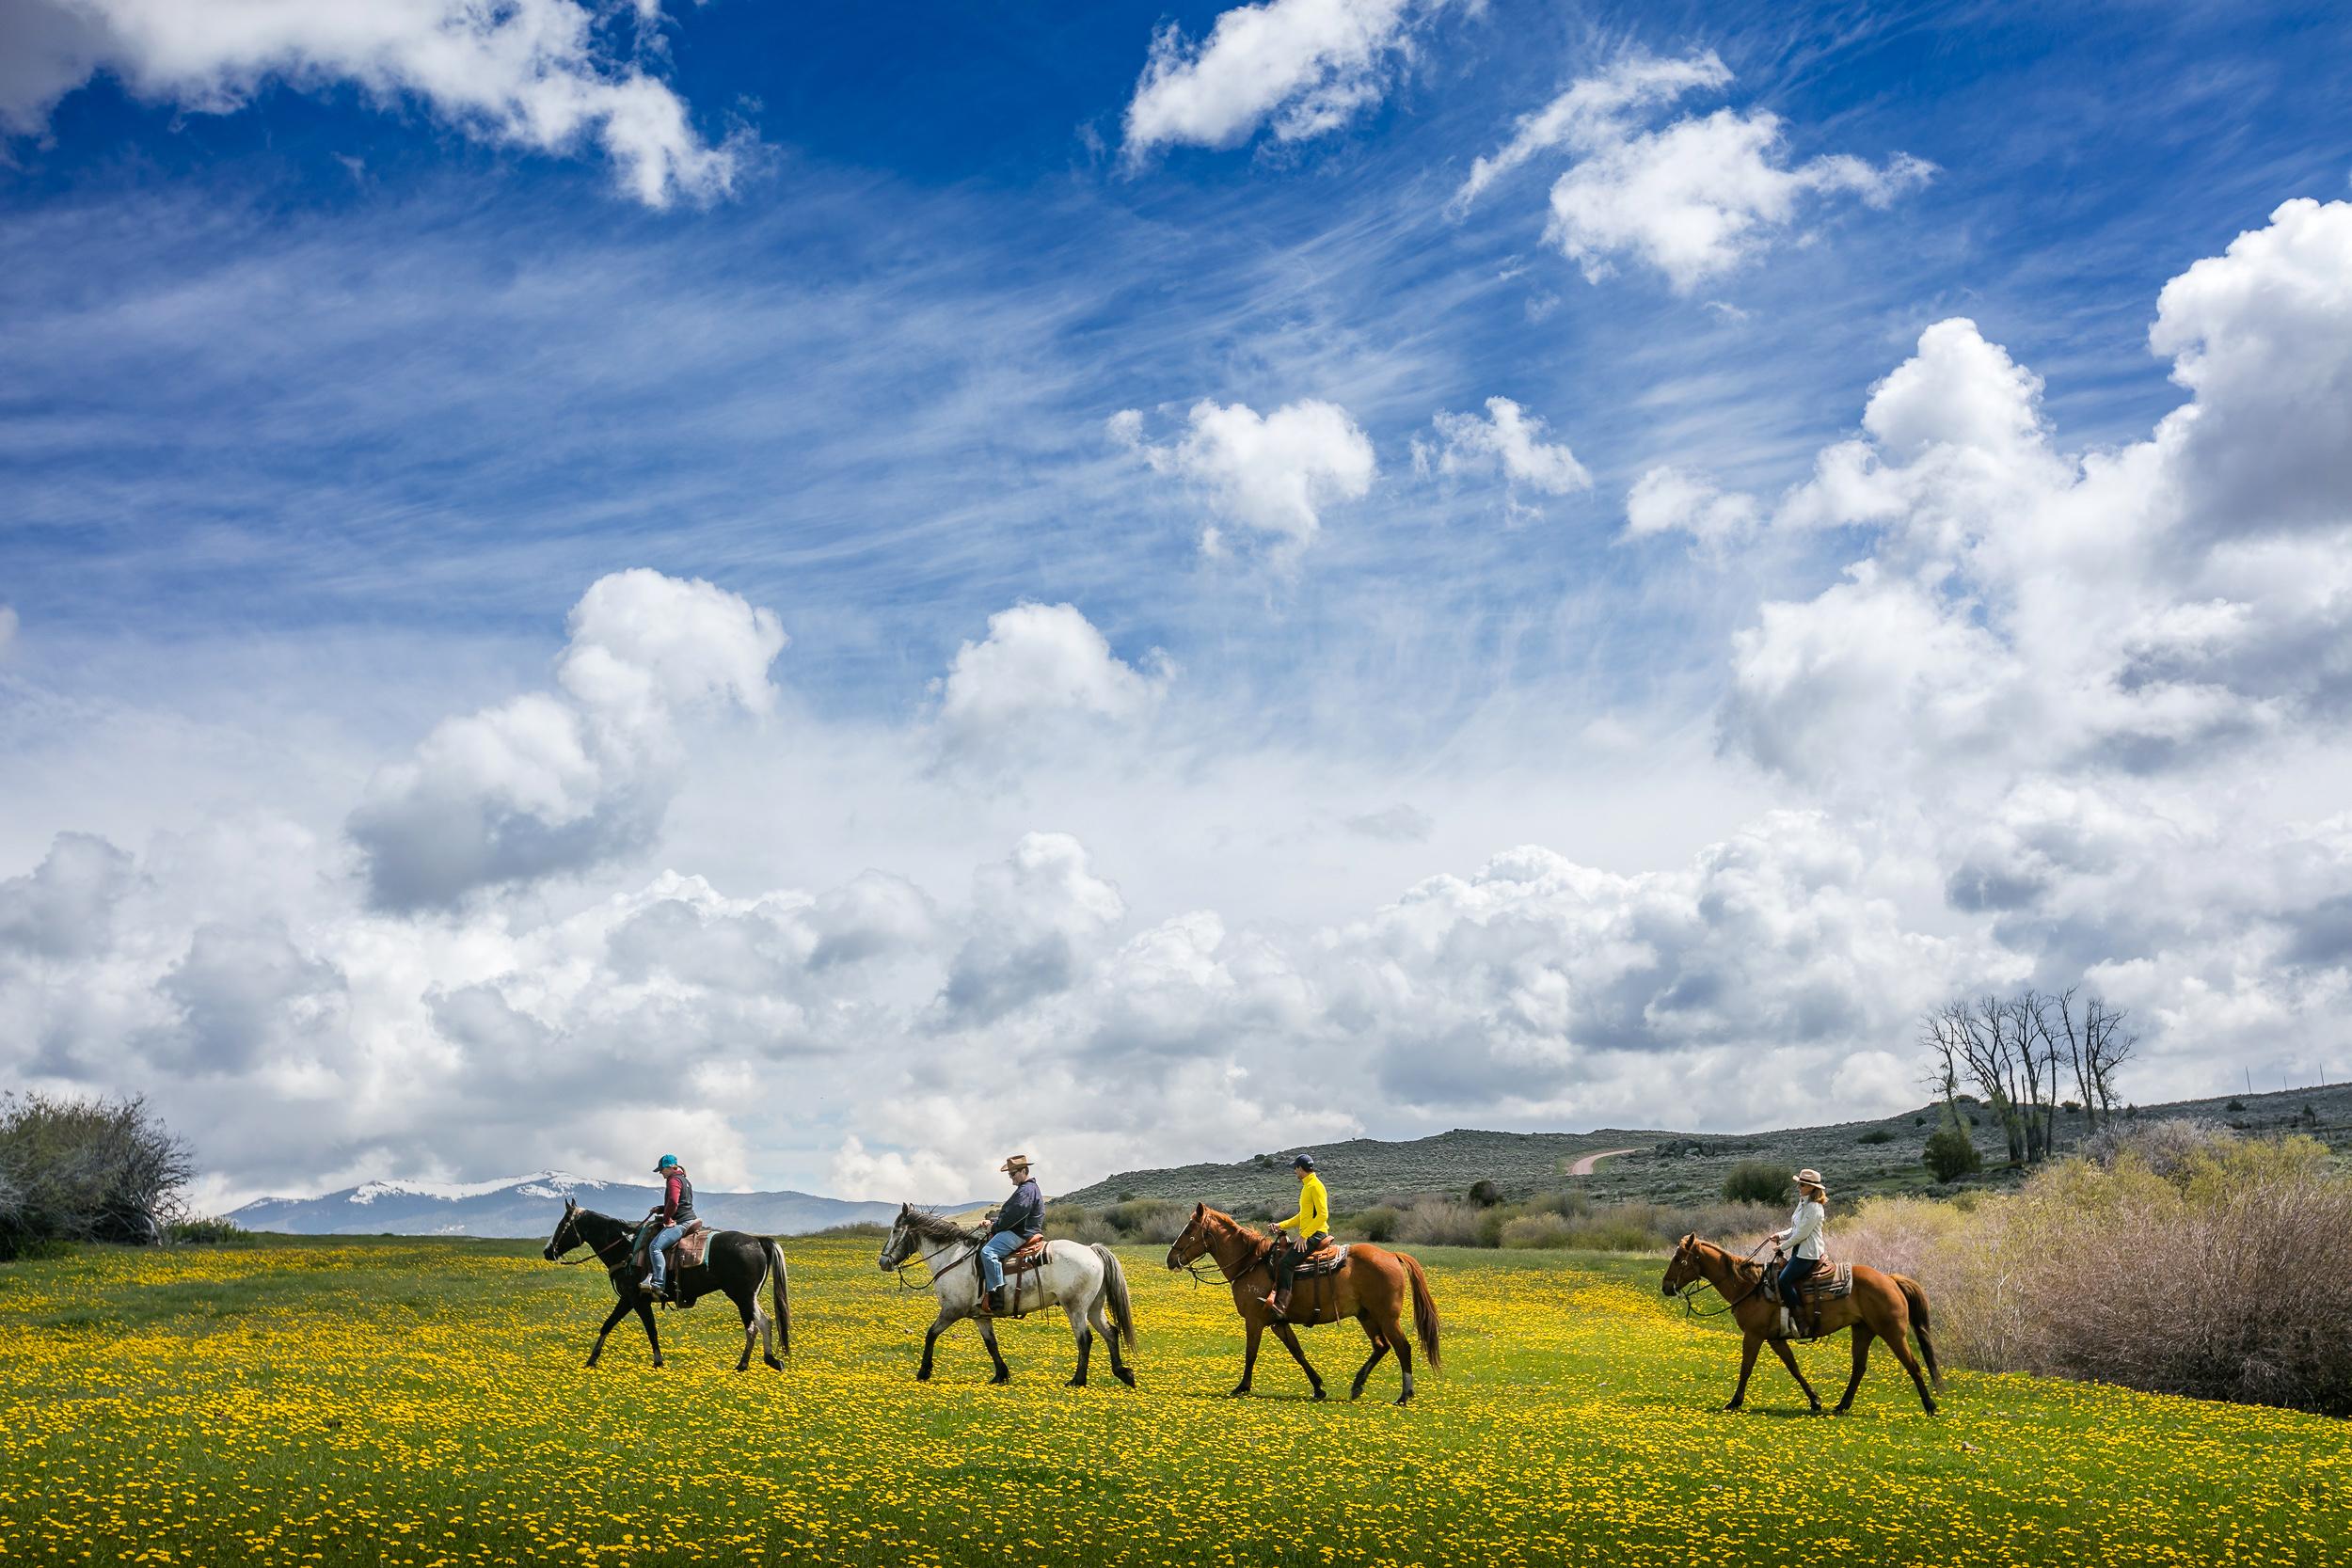 dude ranch honeymoon magee brush creek sky grass horses ride